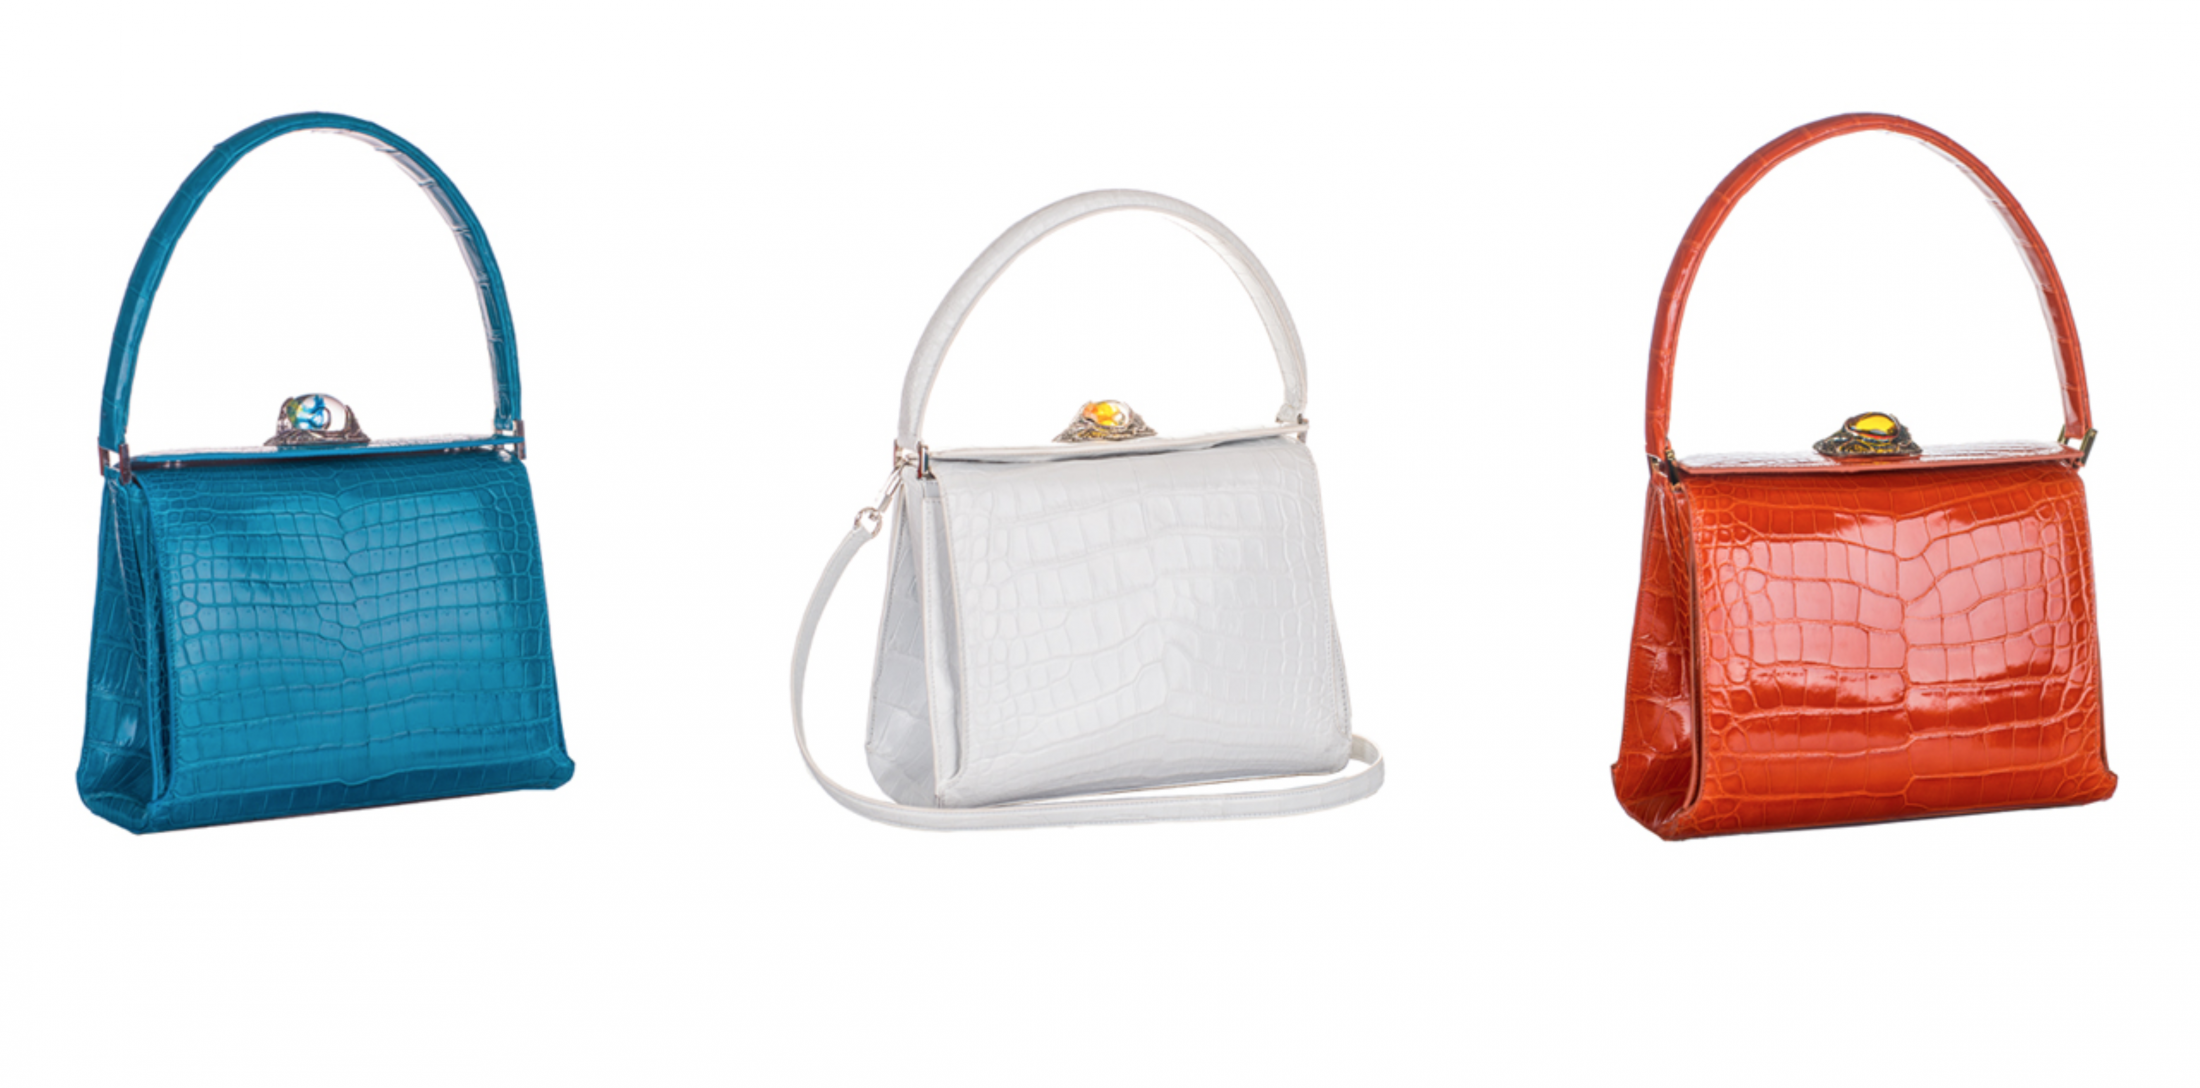 Laminafra Luxury Bags – Still life for www.laminafra.it